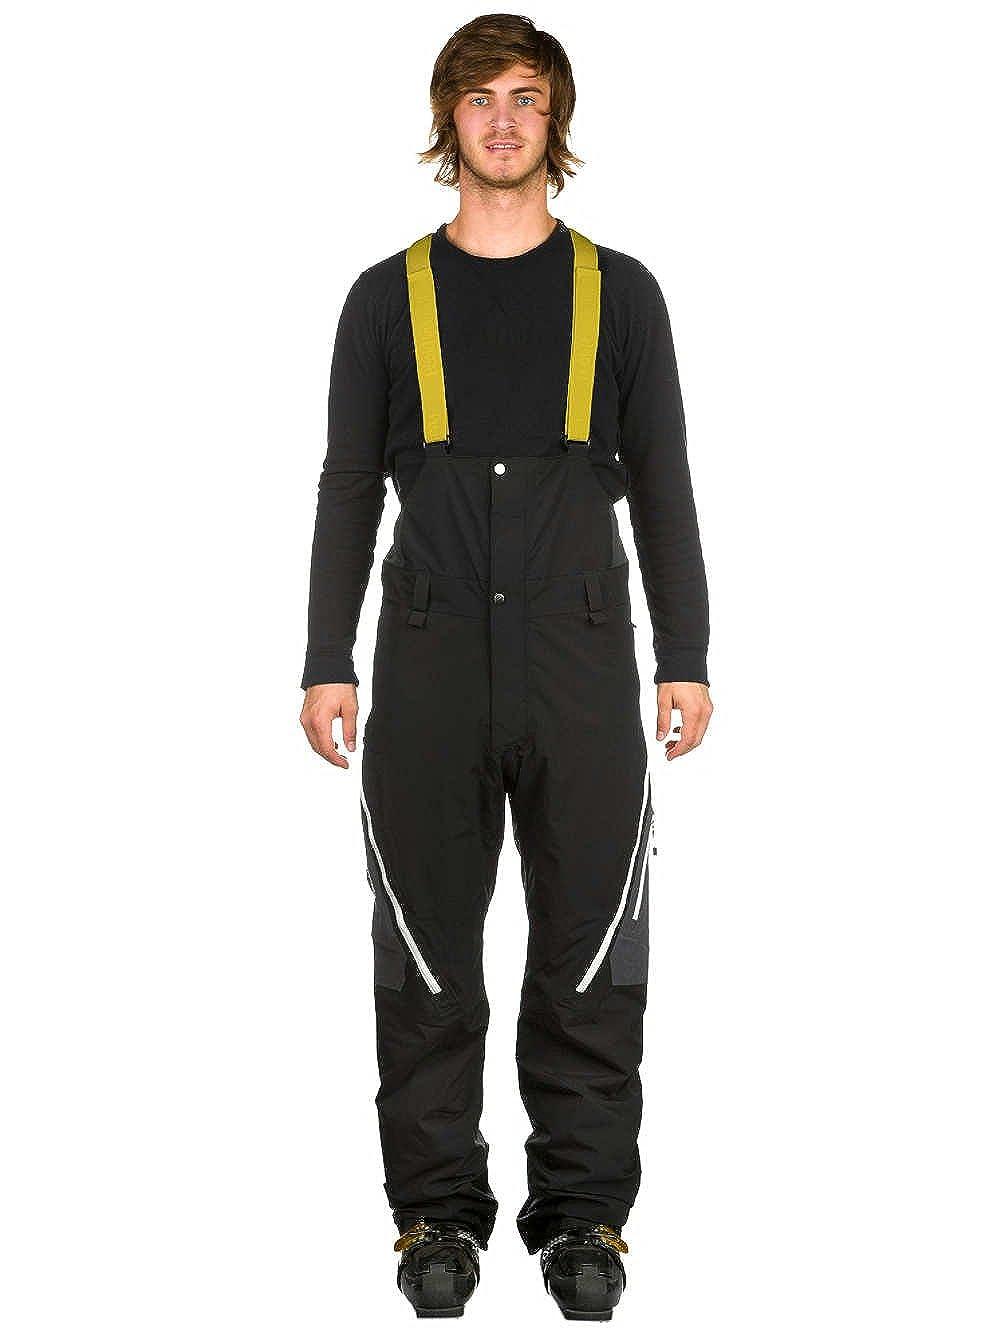 Peak Performance Herren Snowboard Hose T14 Bib Pants